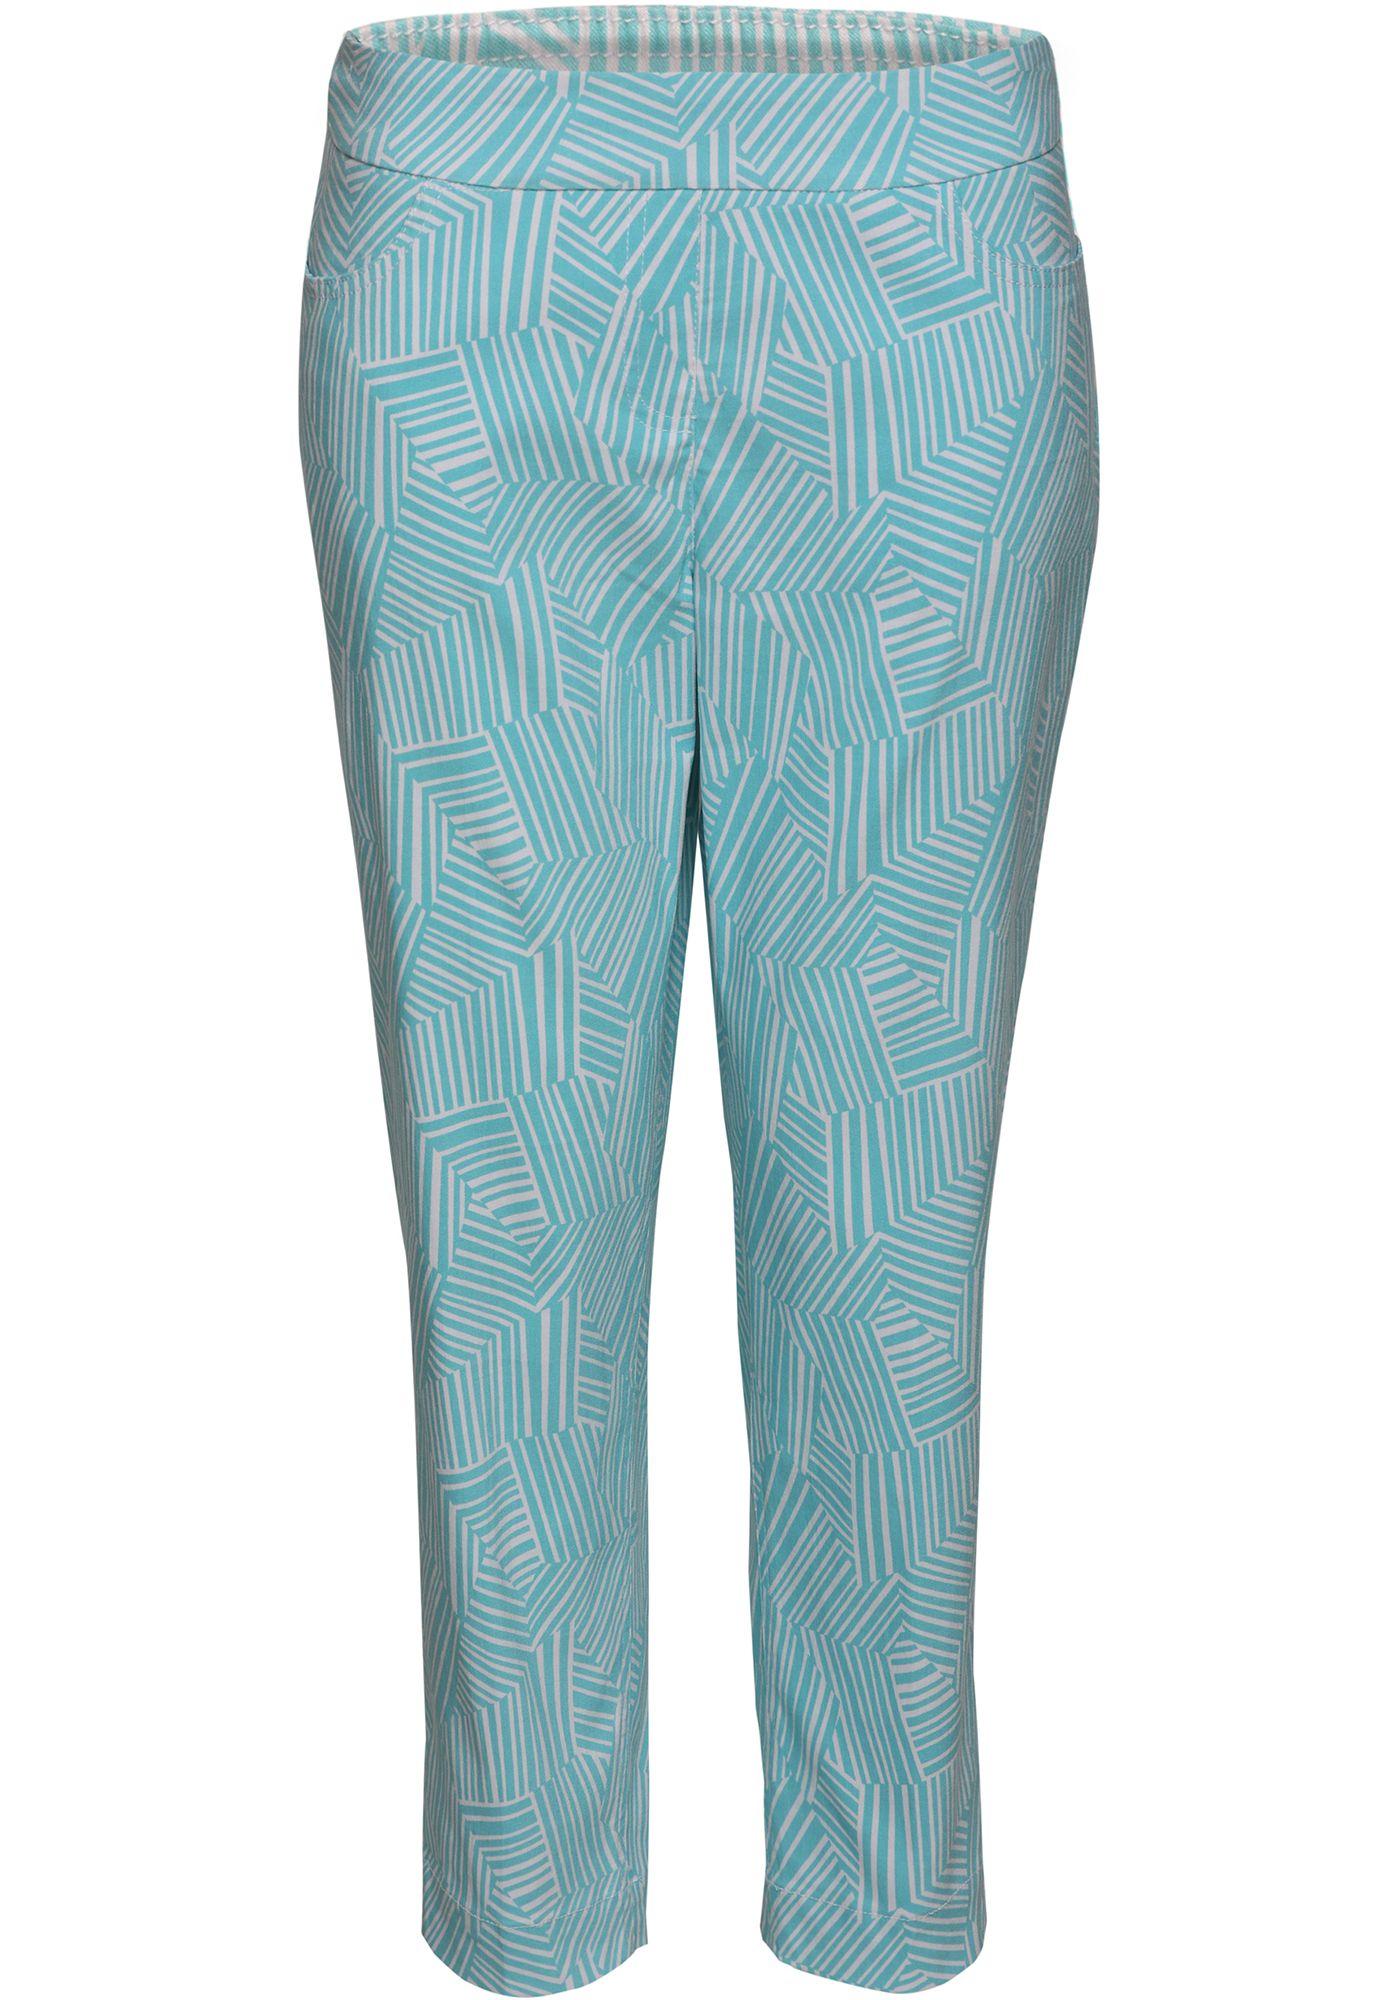 Sport Haley Women's Printed Slim-Sation Cropped Golf Pants